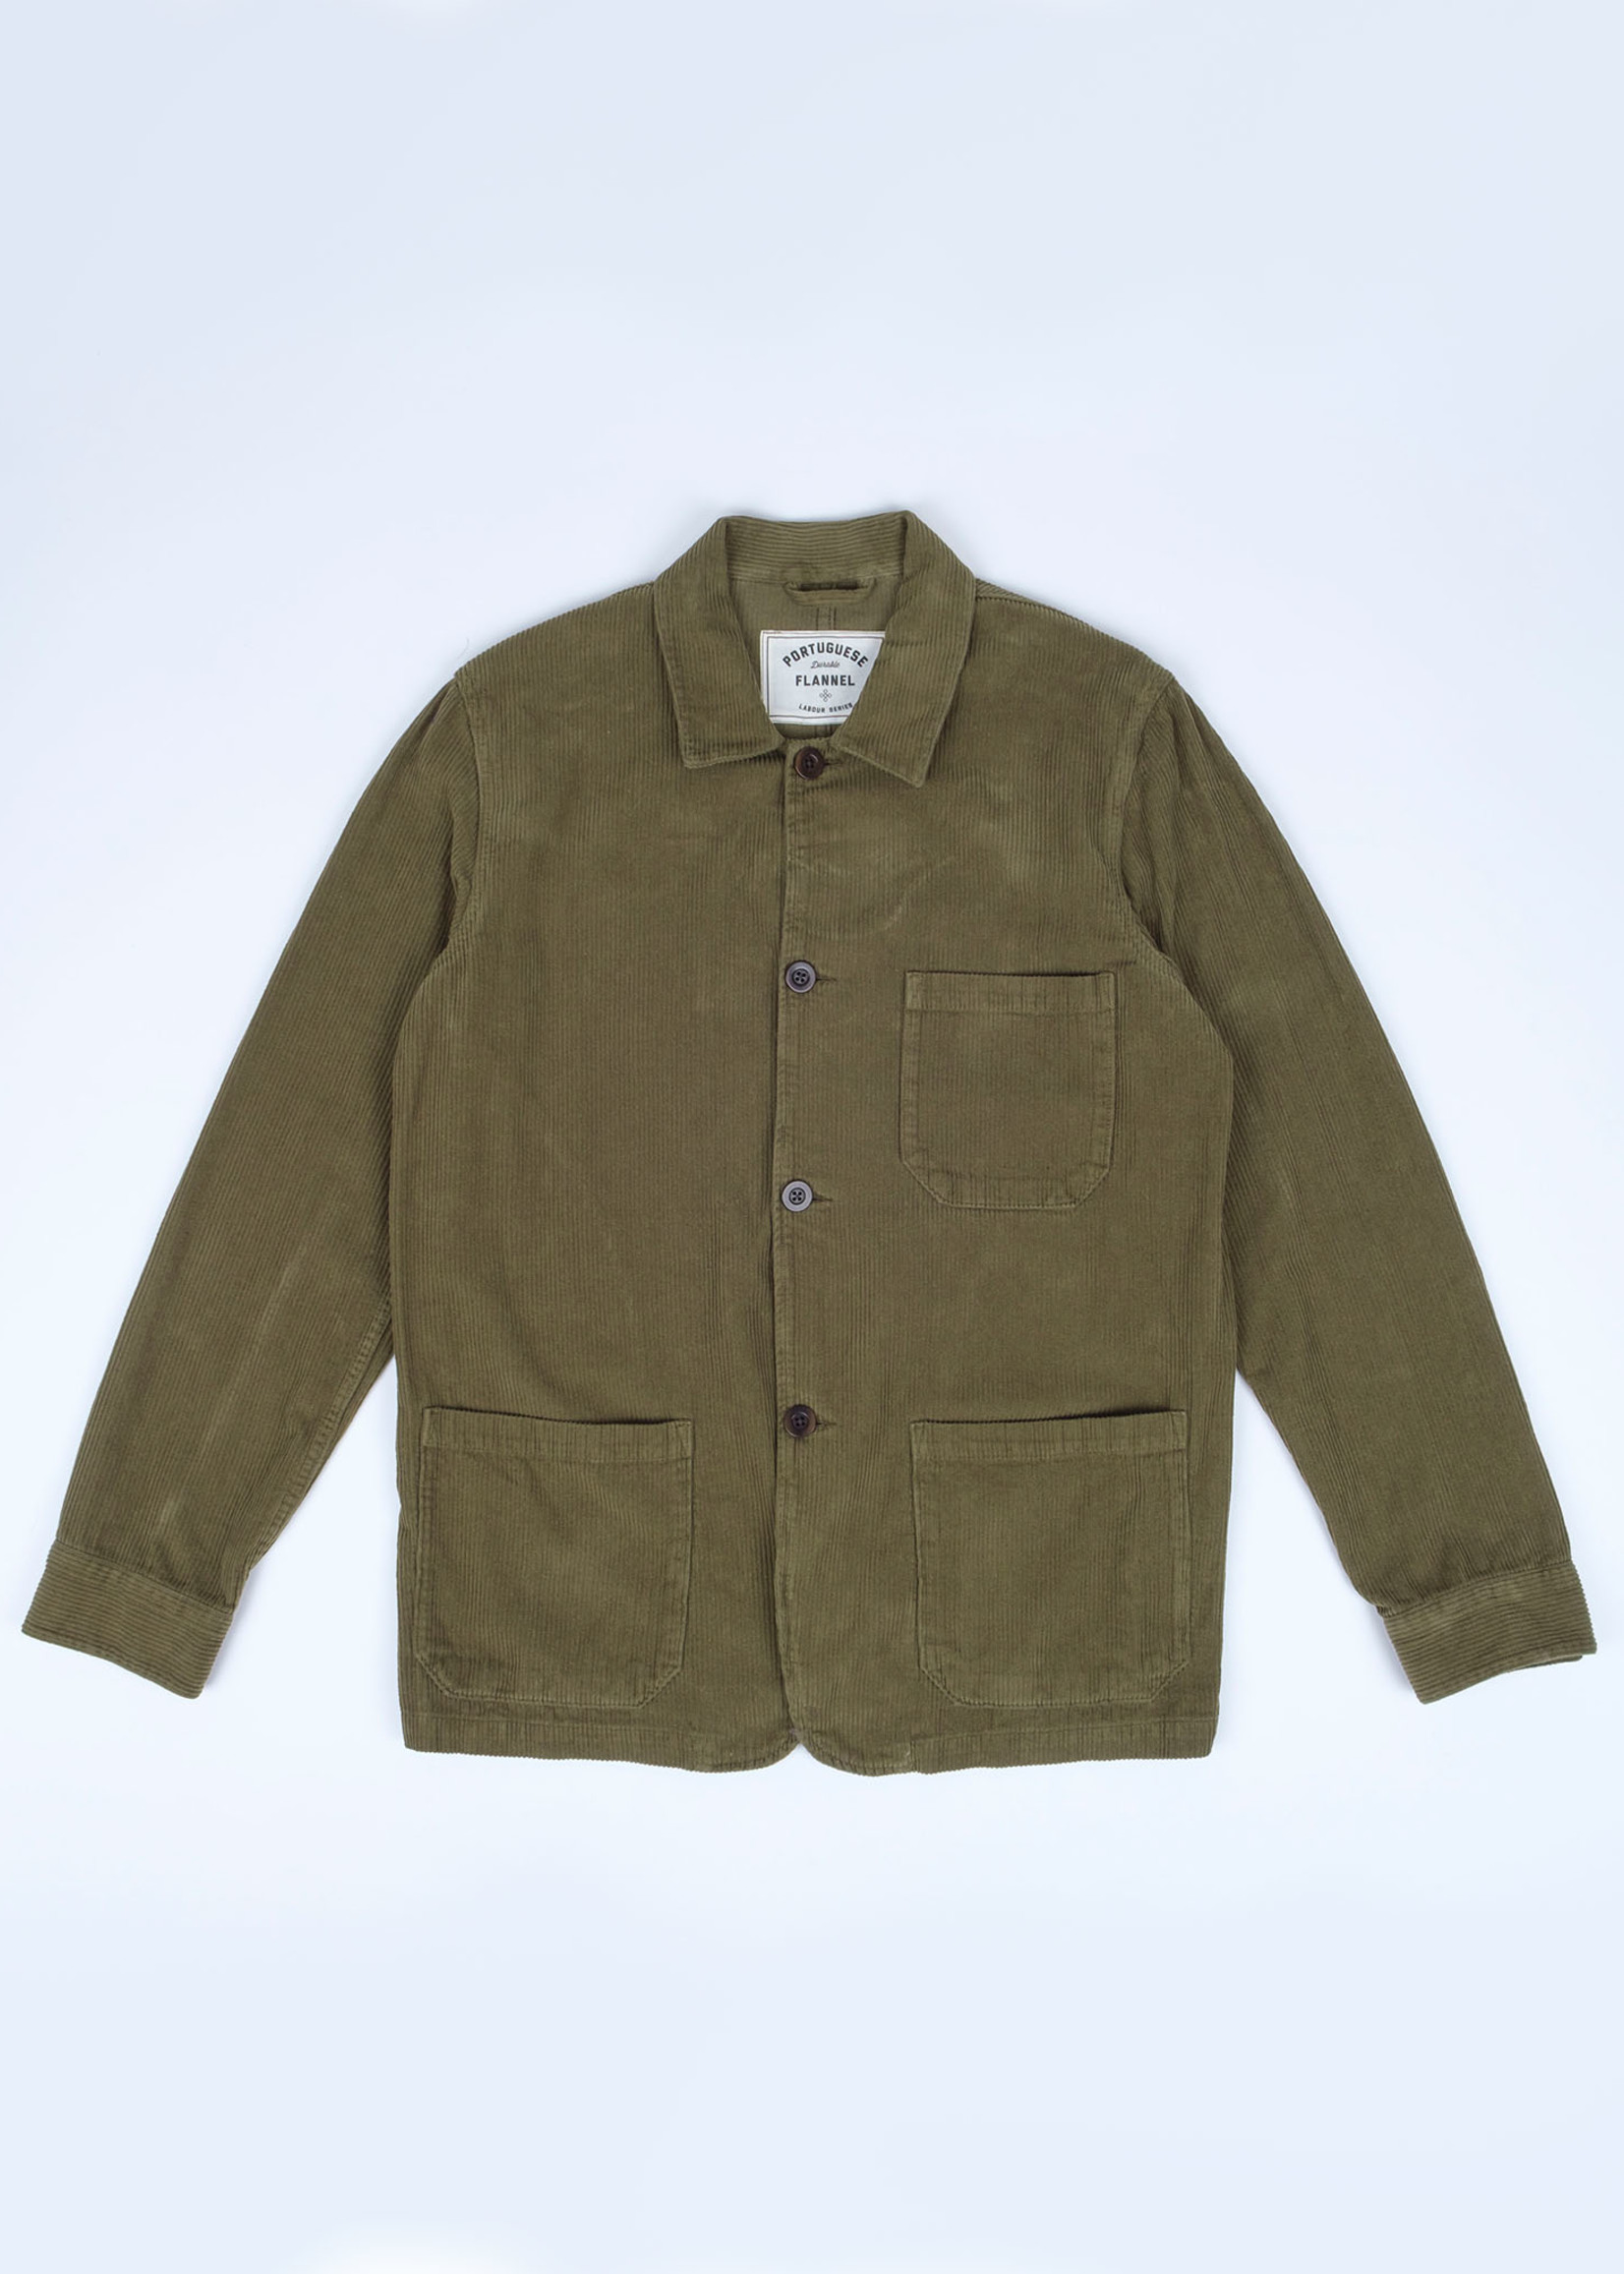 Portuguese Flannel Portuguese Flannel Labura Olive Corduroy Chore Jacket